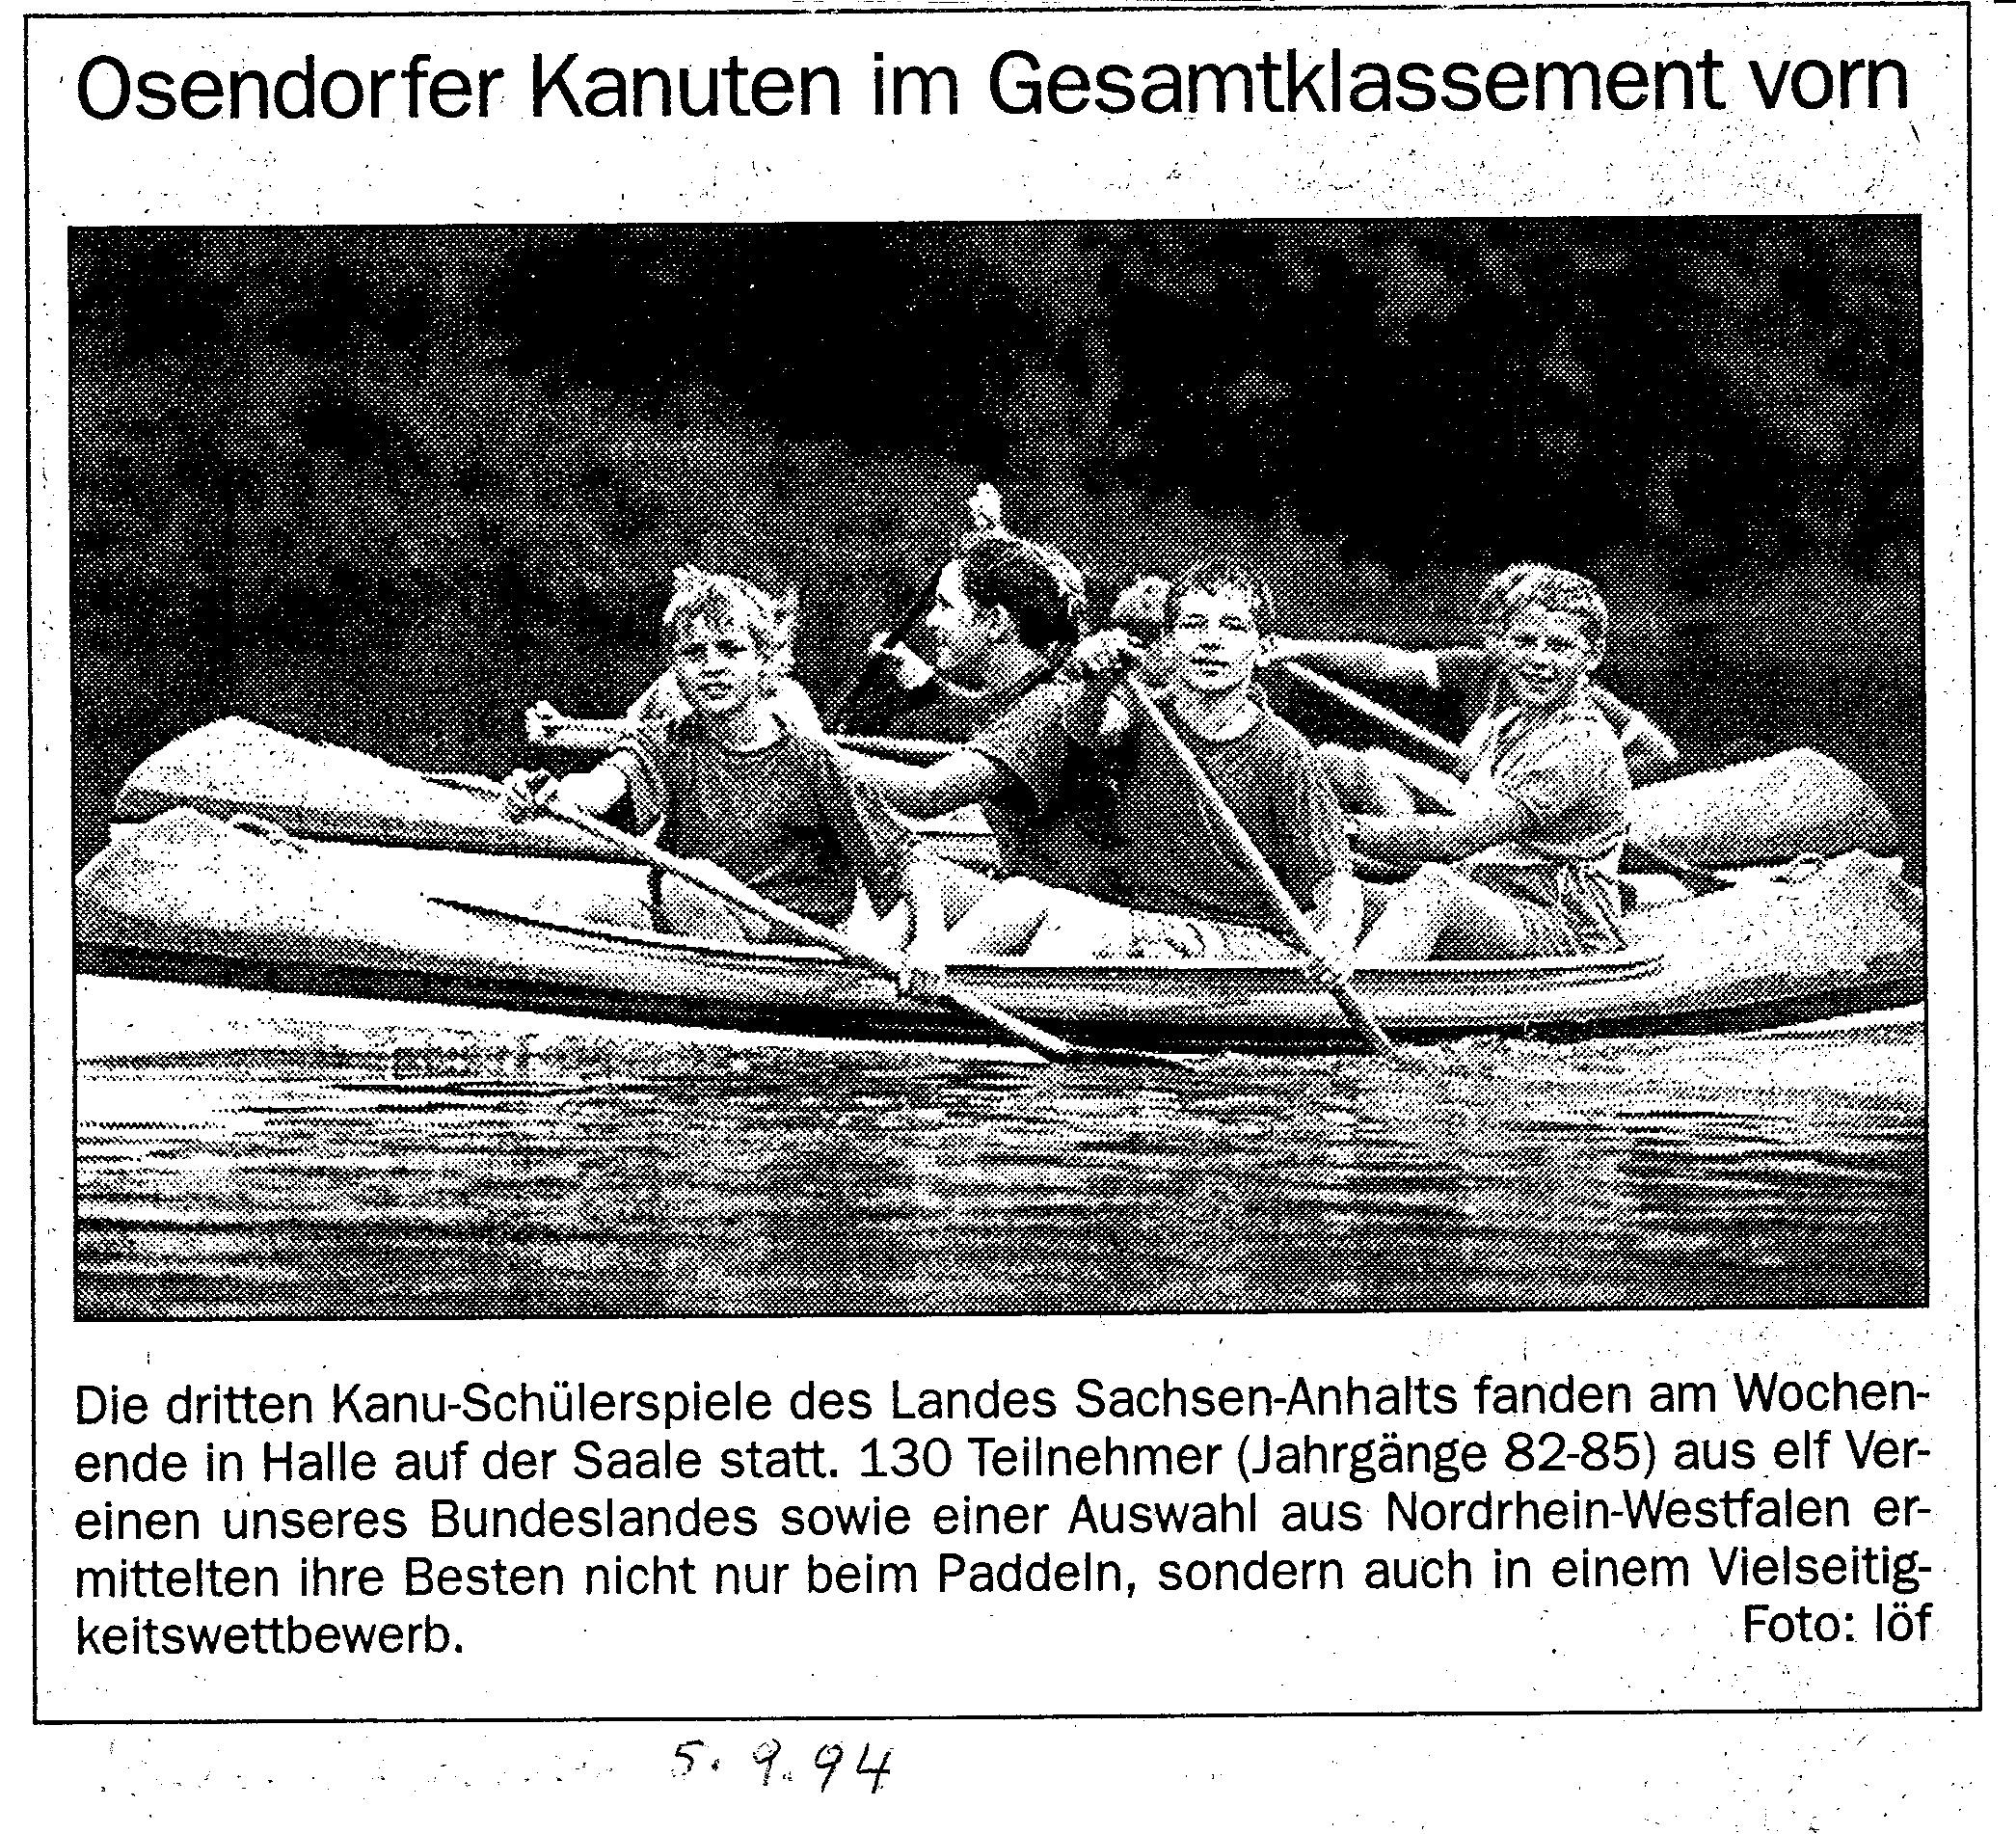 1994-09-05 MZ Osendorfer Kanuten im Gesamtklassement vorn